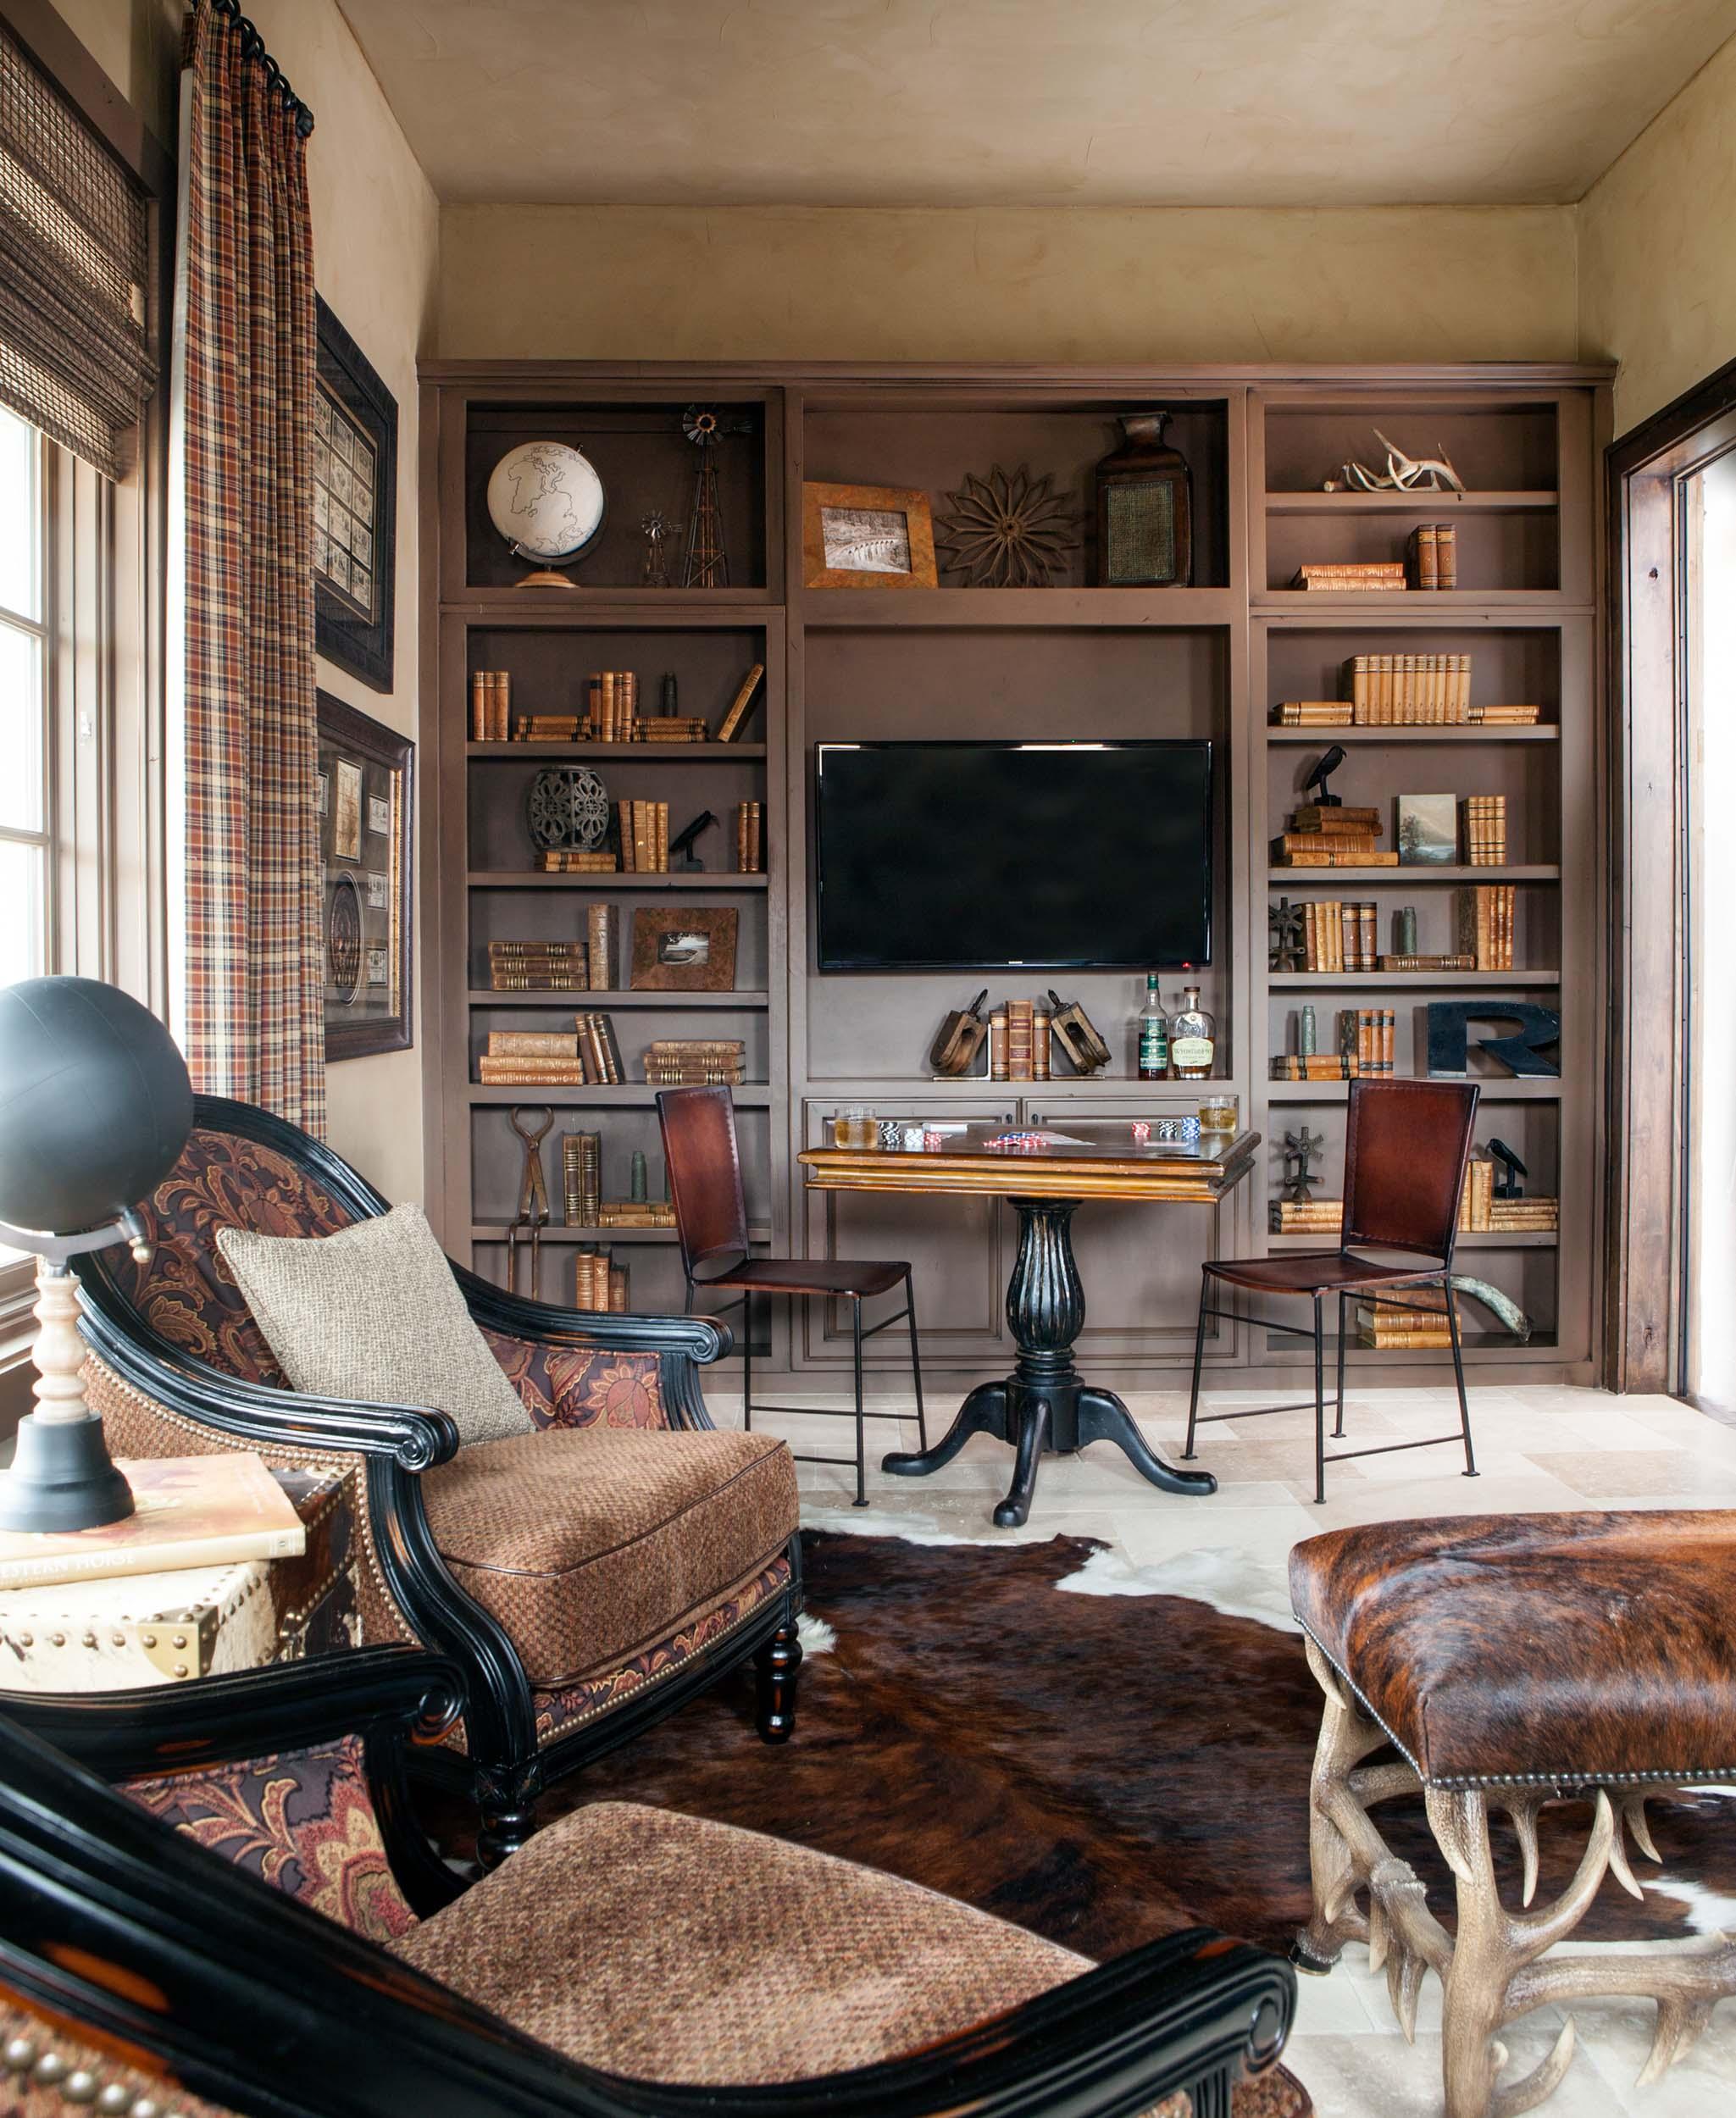 austin-house-study-interior-design.jpg